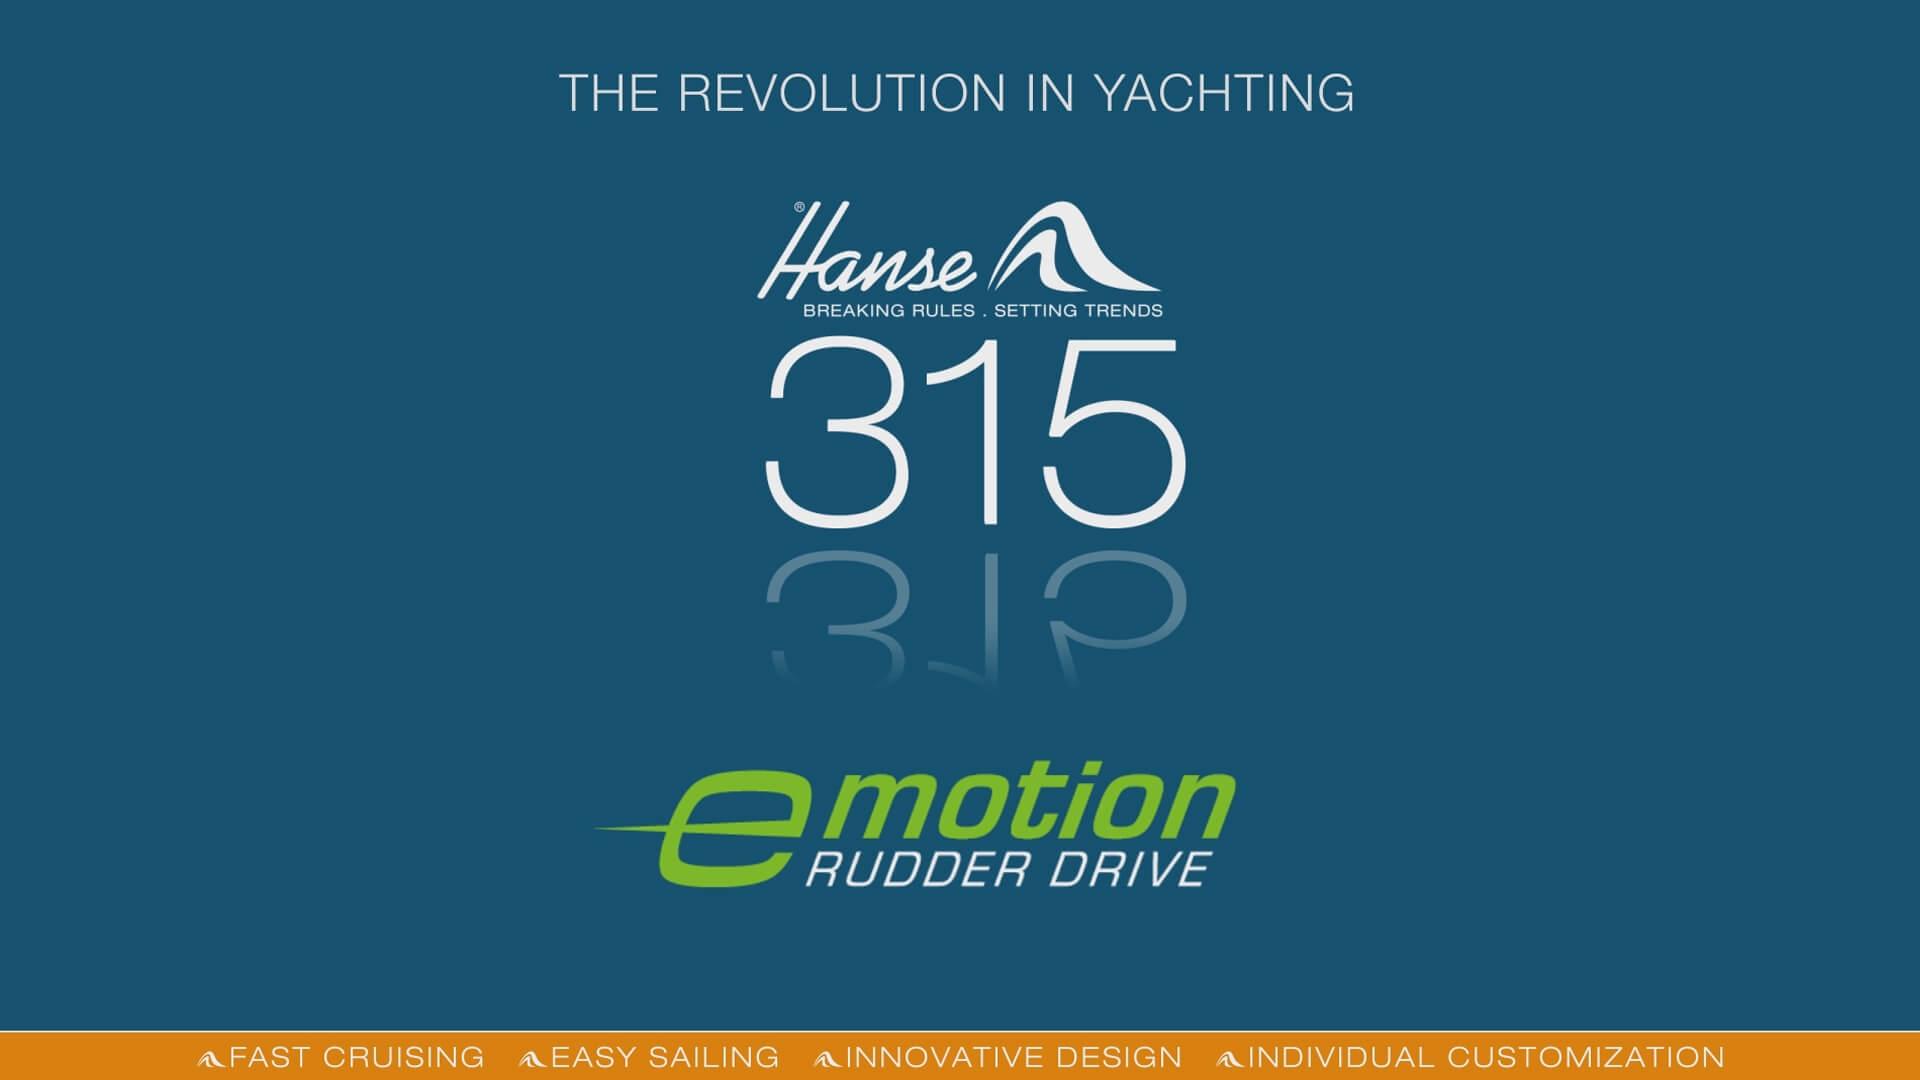 Hanse e-motion RUDDER DRIVE